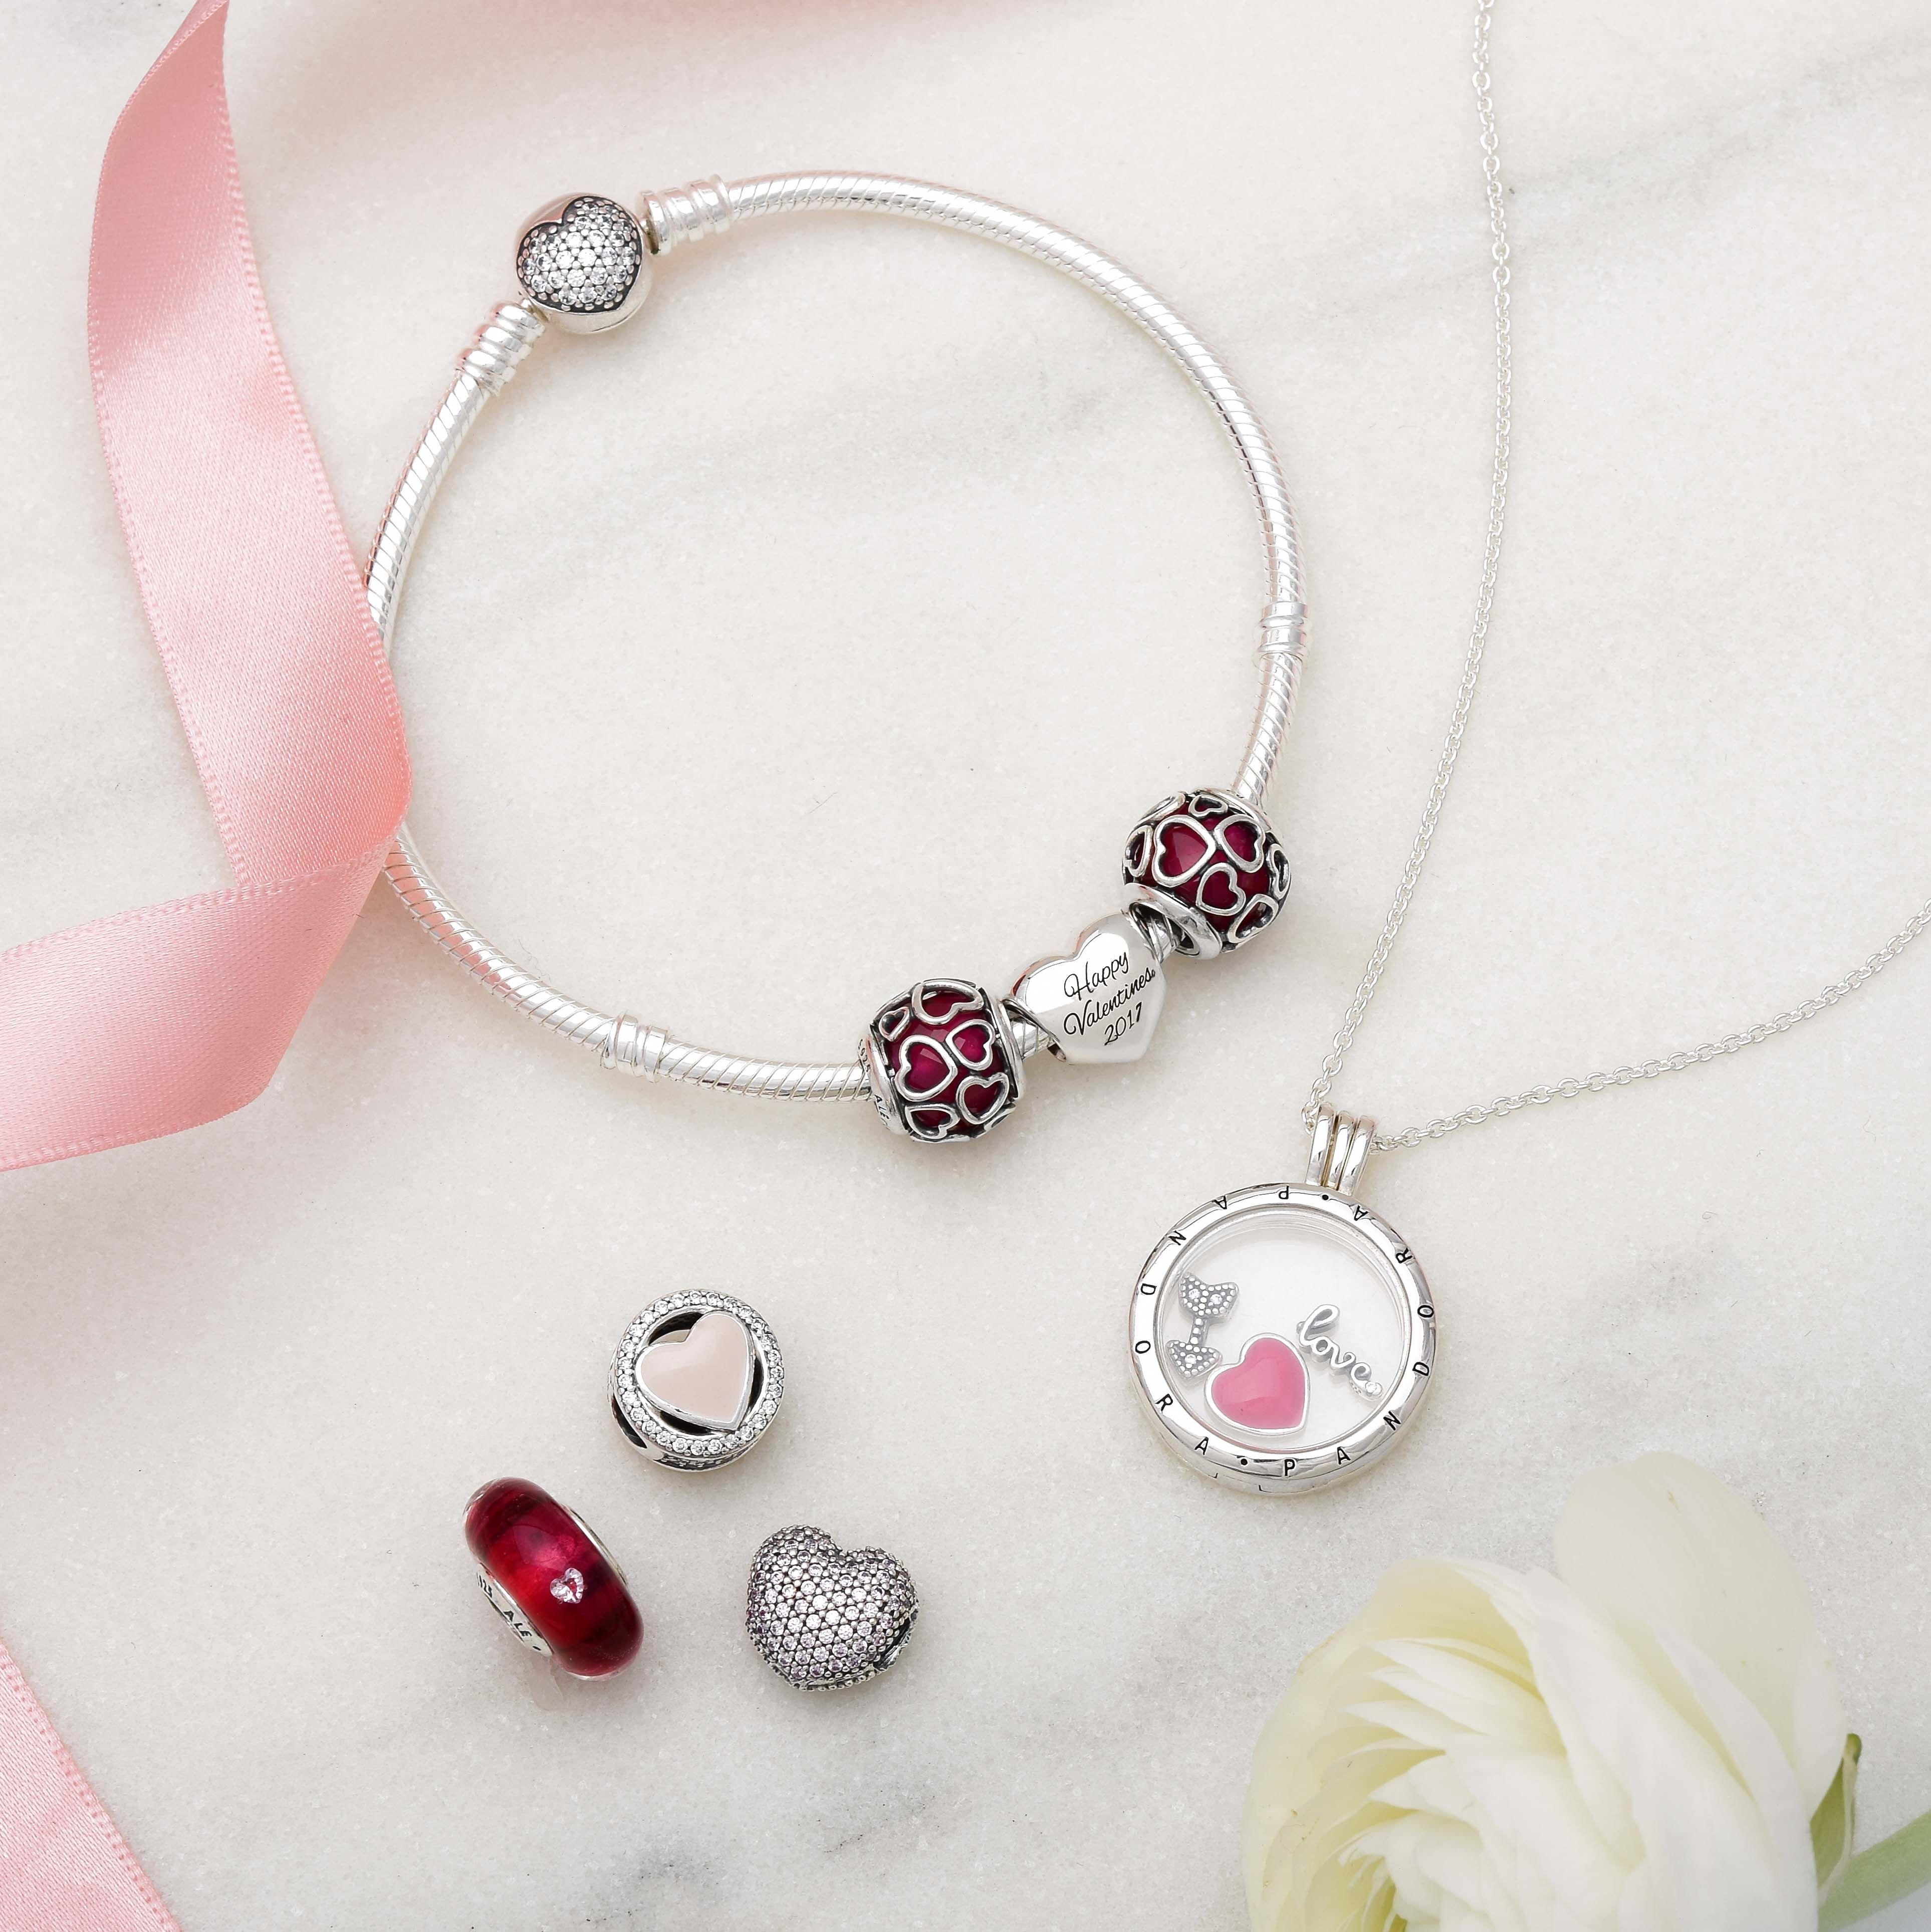 pandora valentines day 2017 shop the look at john greed jewellery httpjgj - Pandora Valentines